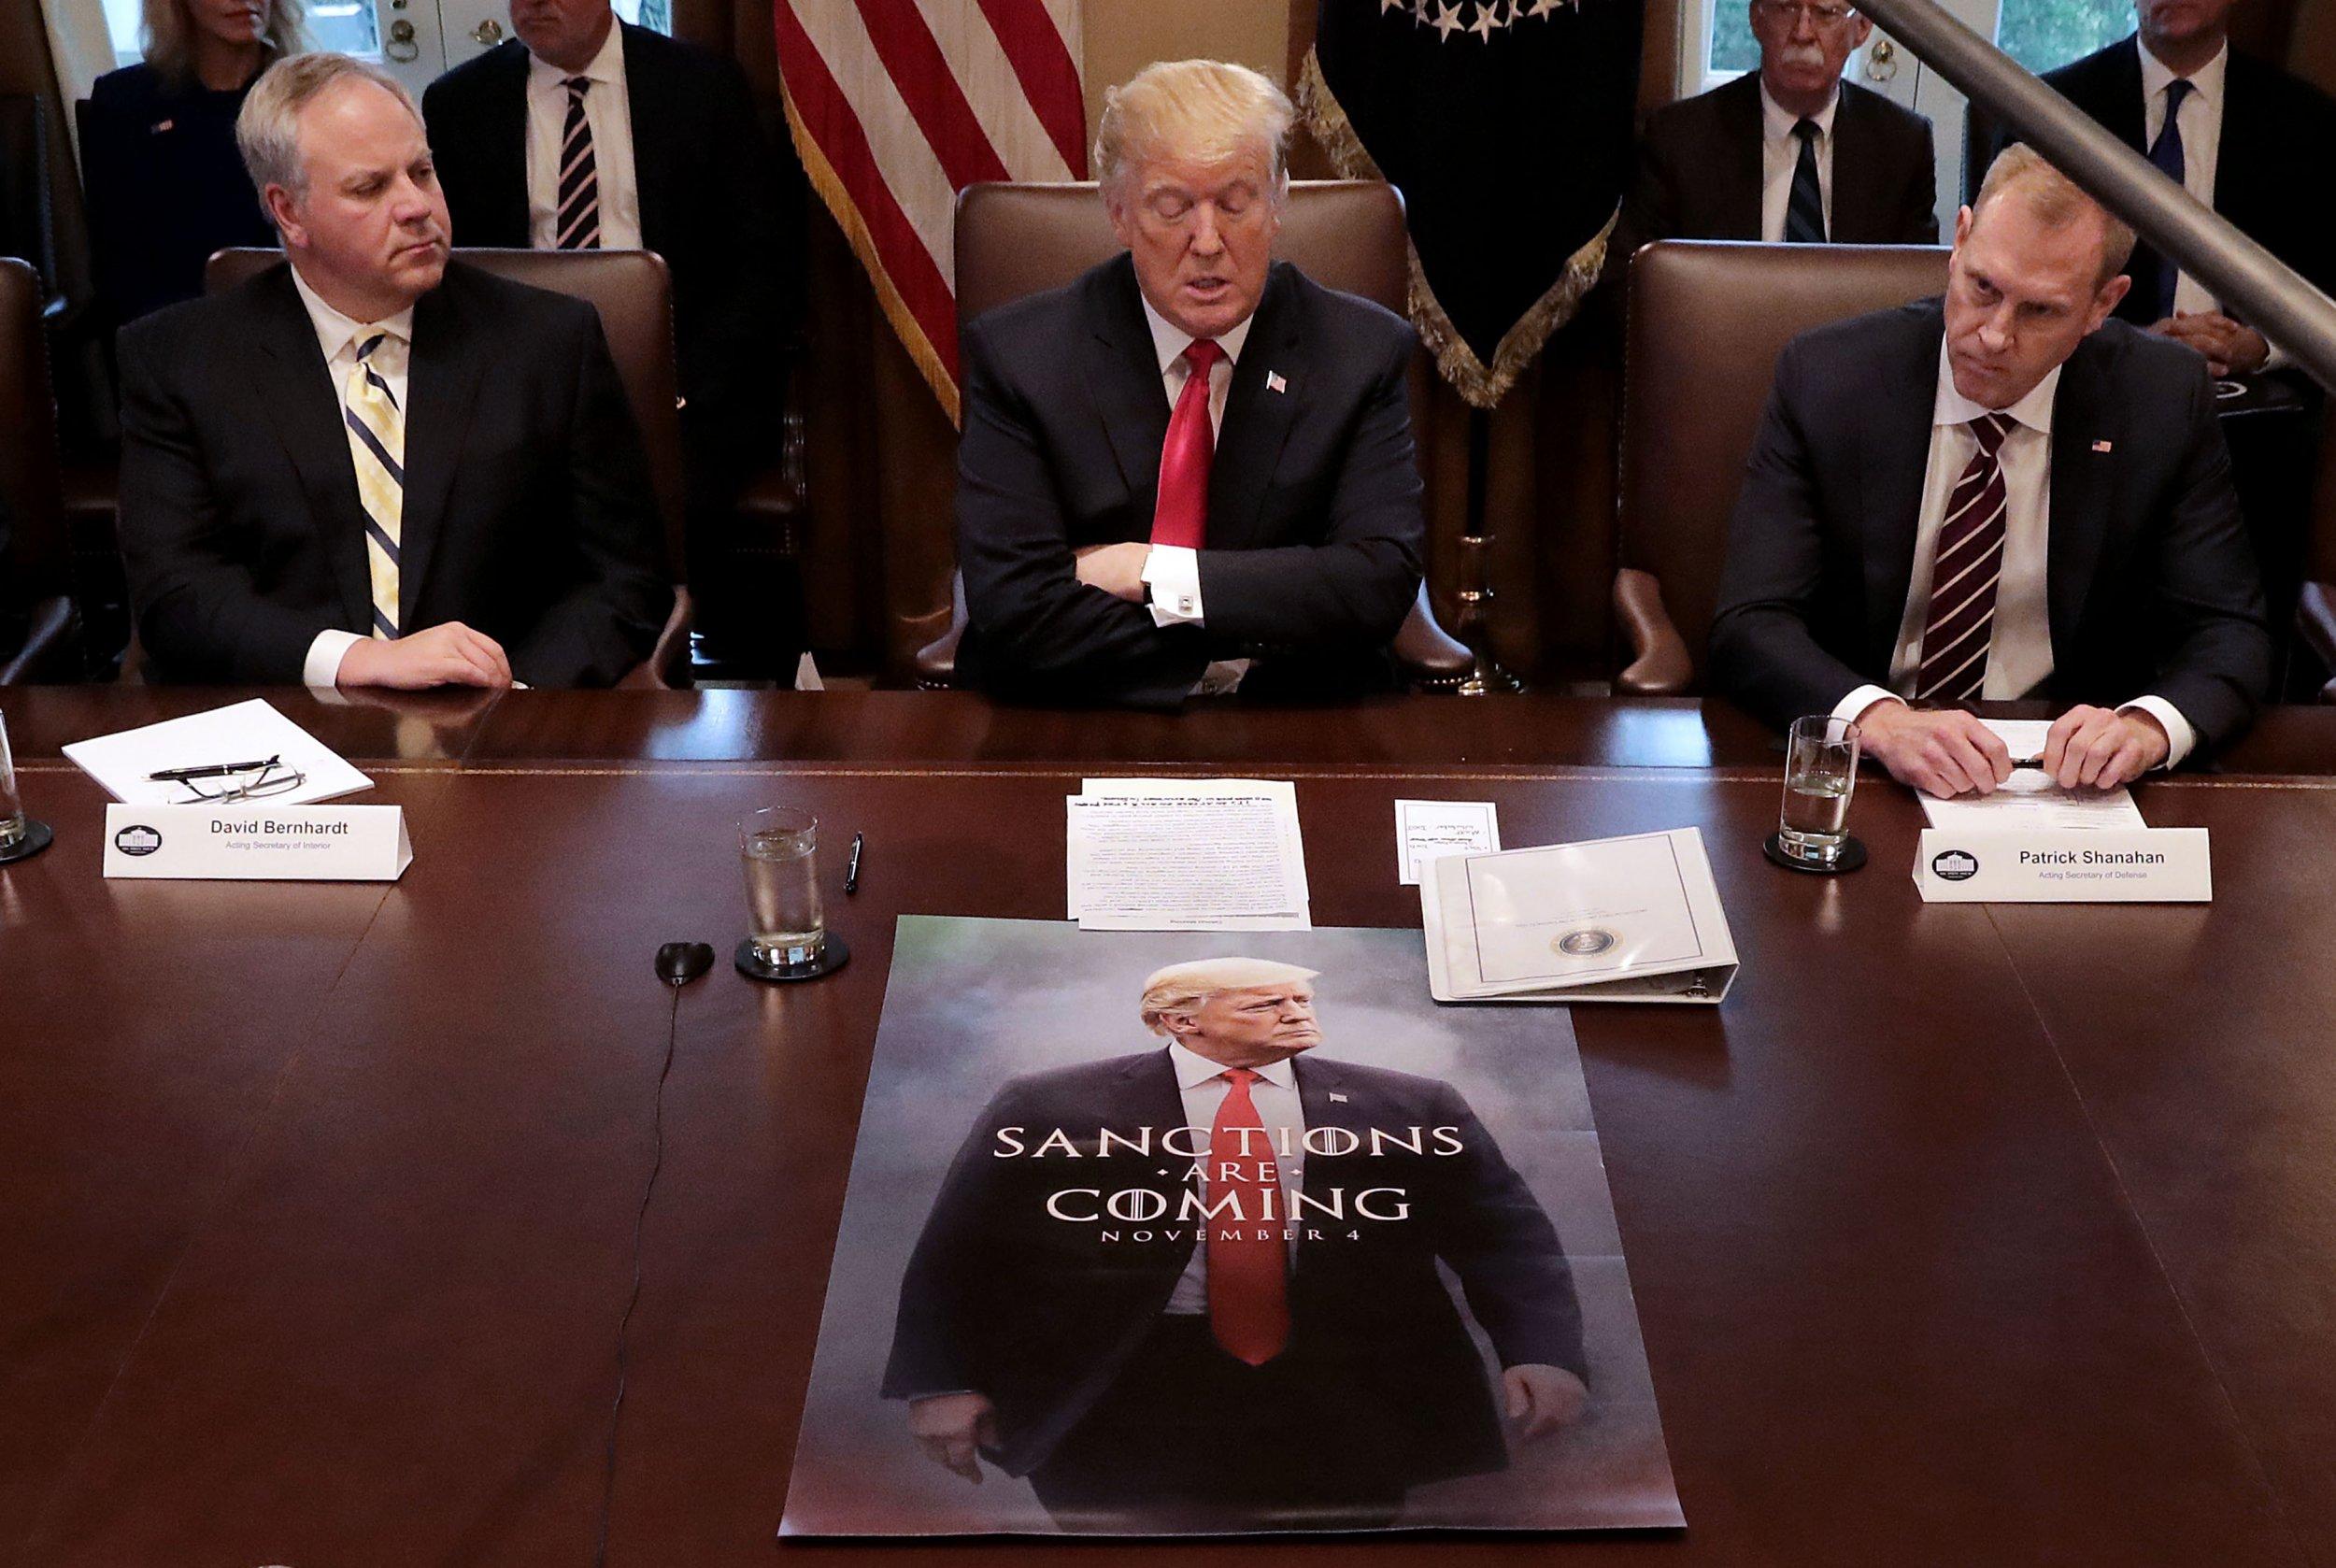 Donald Trump, Border Wall, Game of Thrones, Twitter, Shutdown, Stephen Colbert